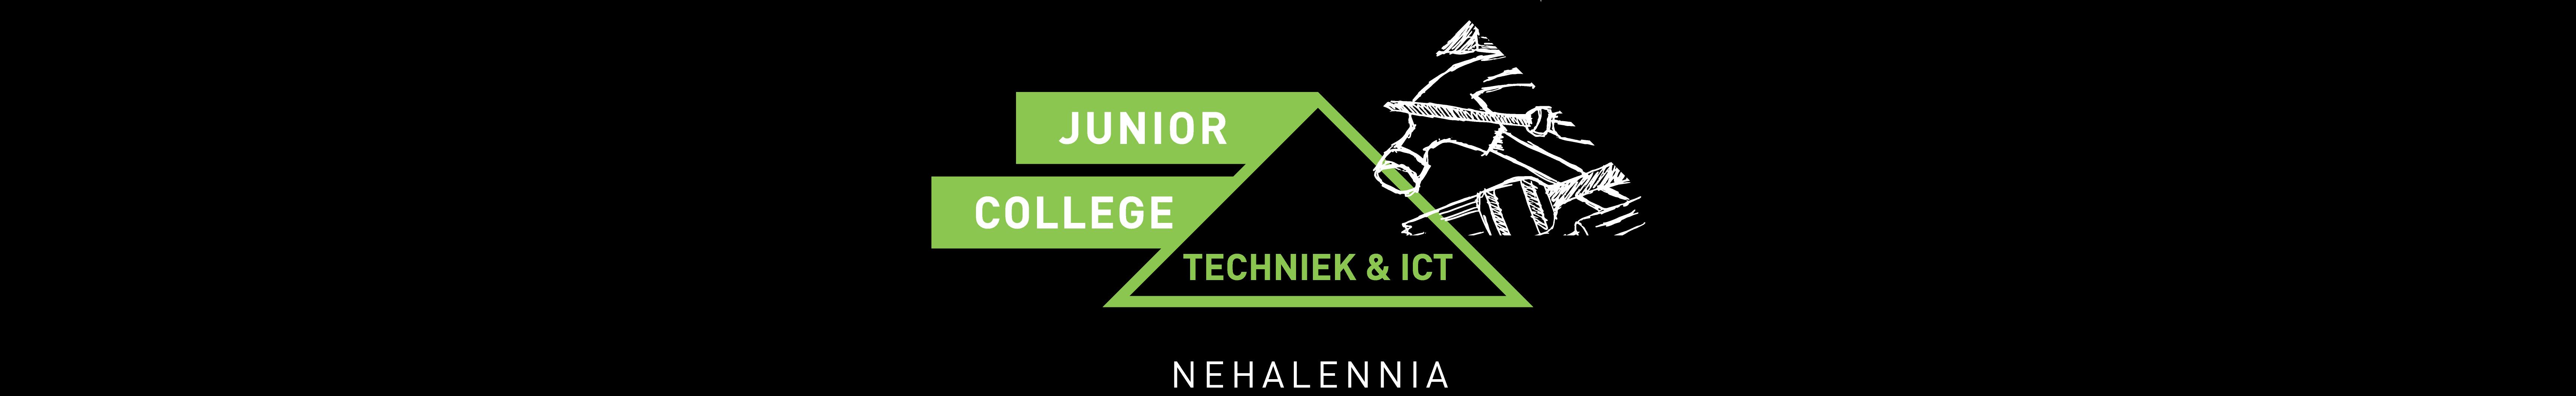 Nehalennia Techniek en ICT 1e jaar